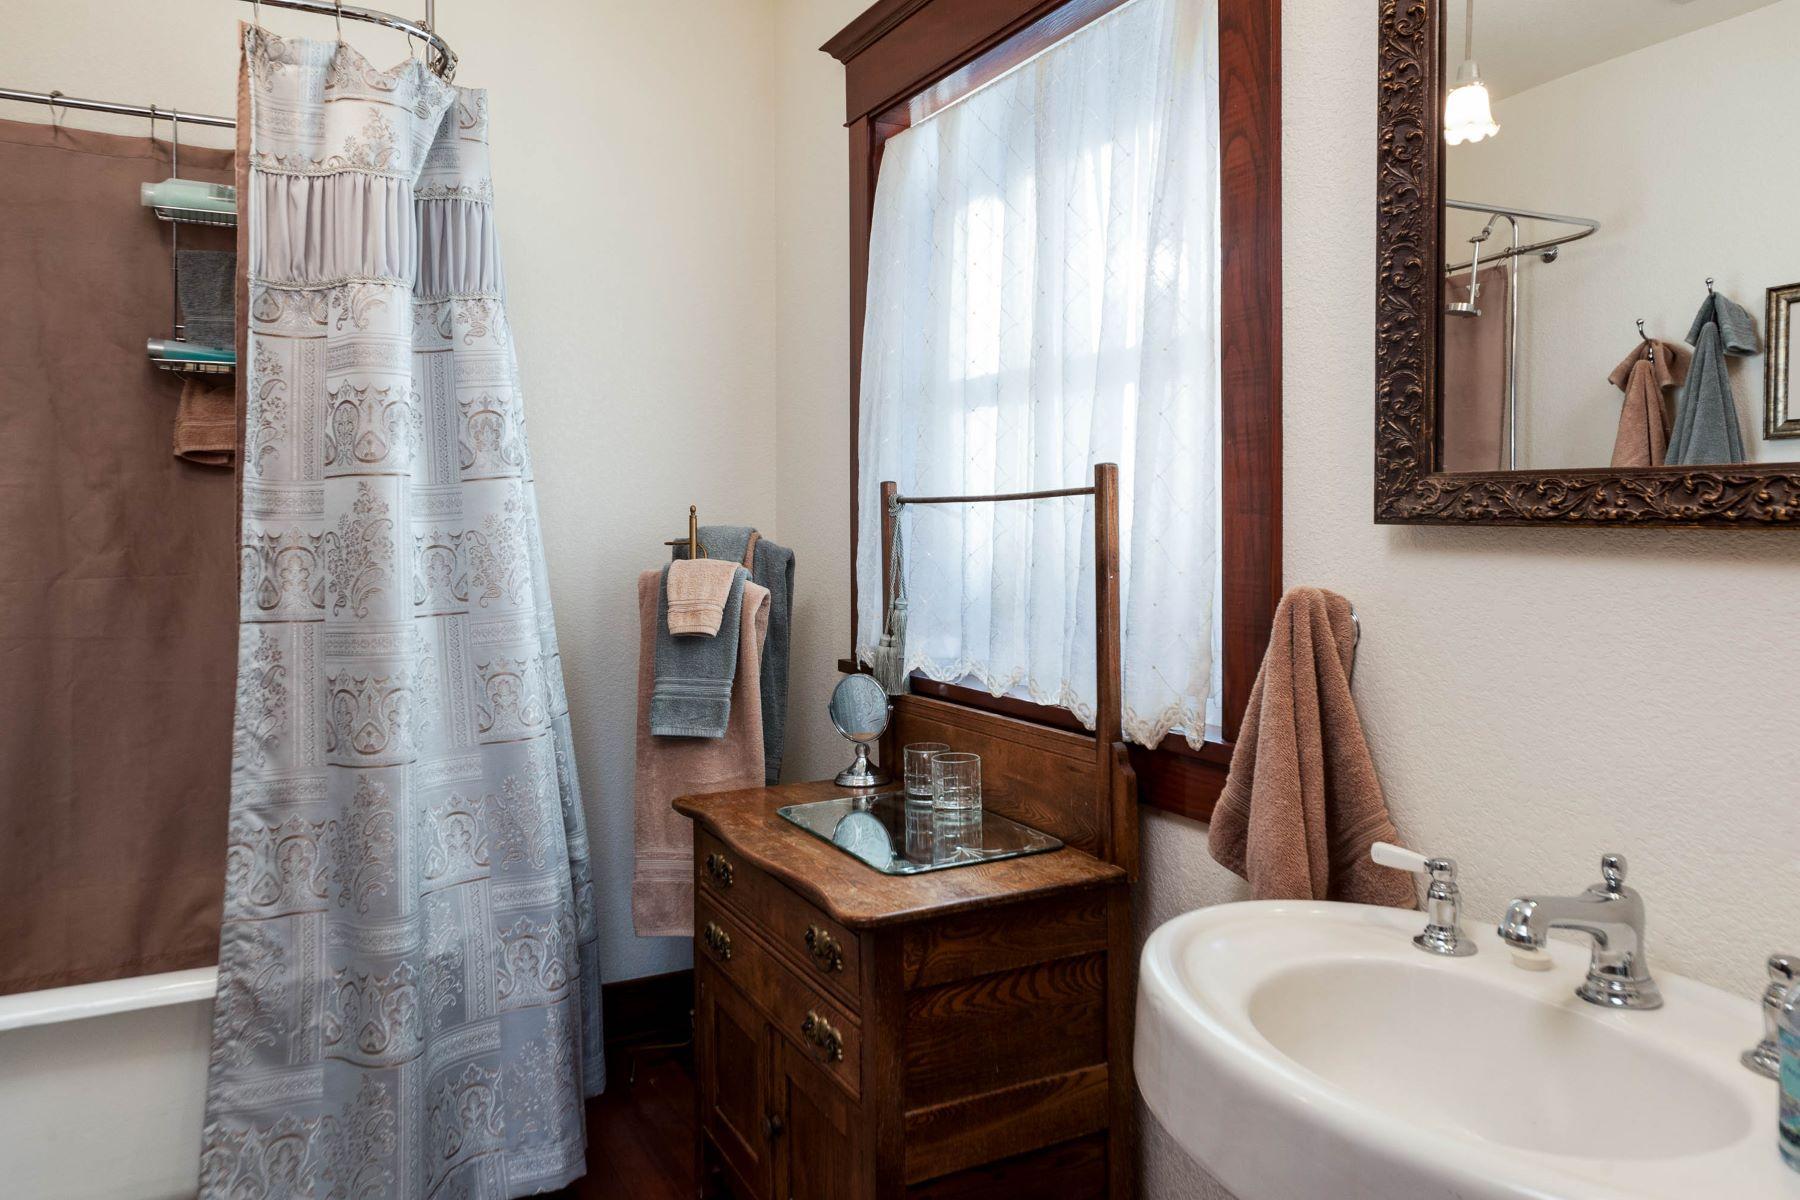 Additional photo for property listing at Lavishly Restored Port Orchard Home 228 Seattle Ave Port Orchard, Washington 98366 United States